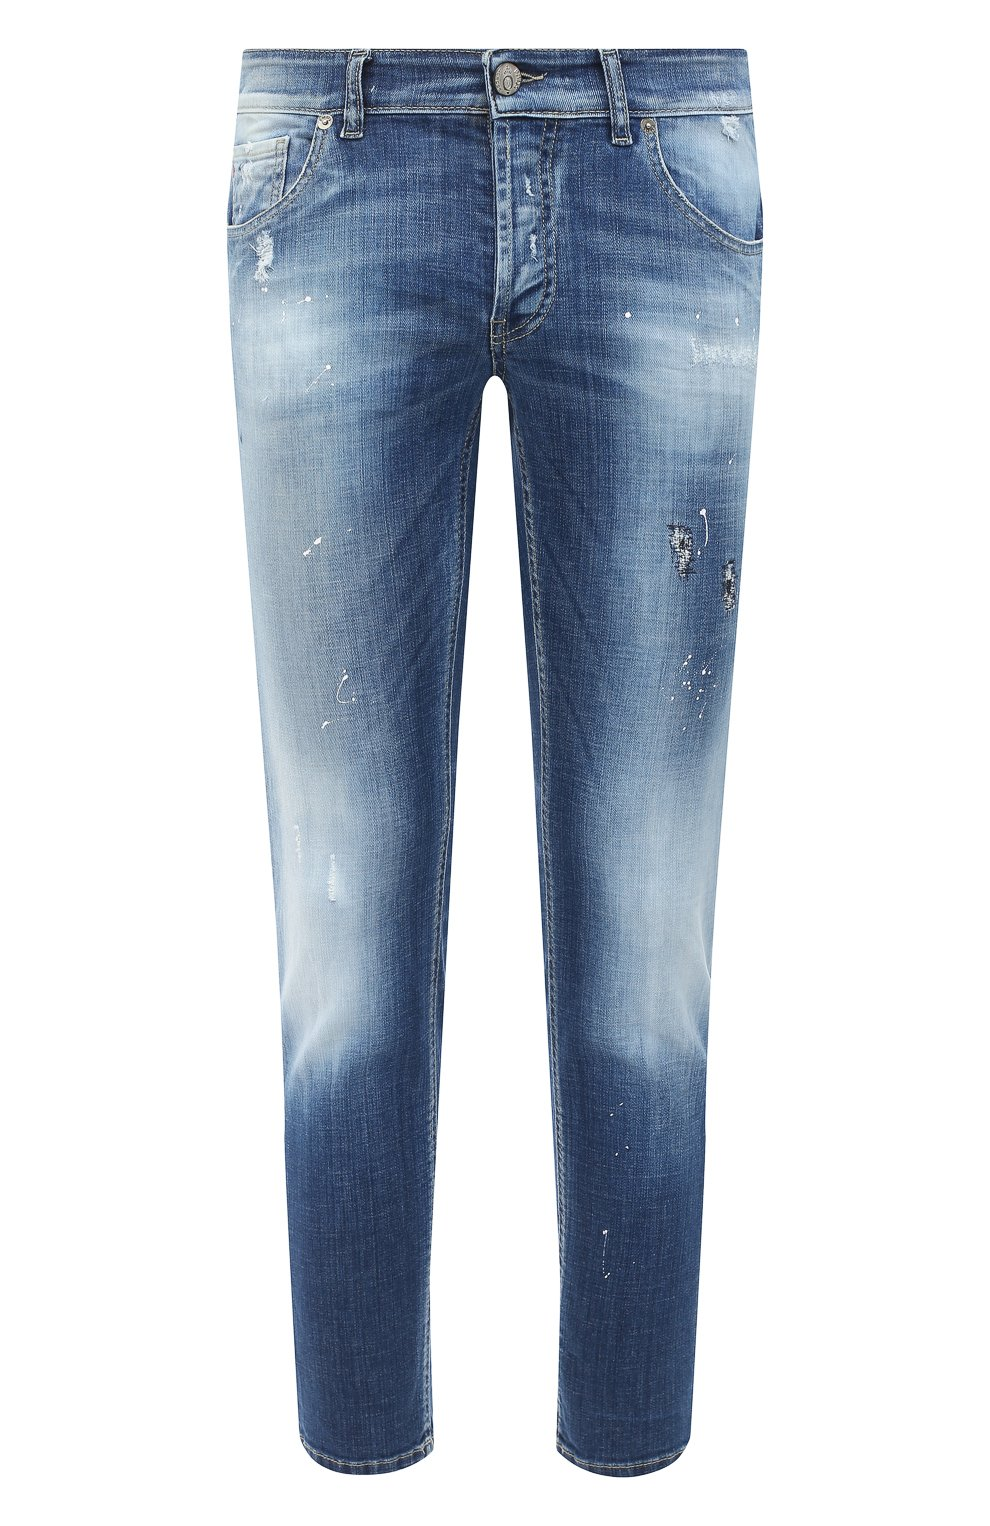 Мужские джинсы PREMIUM MOOD DENIM SUPERIOR синего цвета, арт. F21 310340025/PAUL   Фото 1